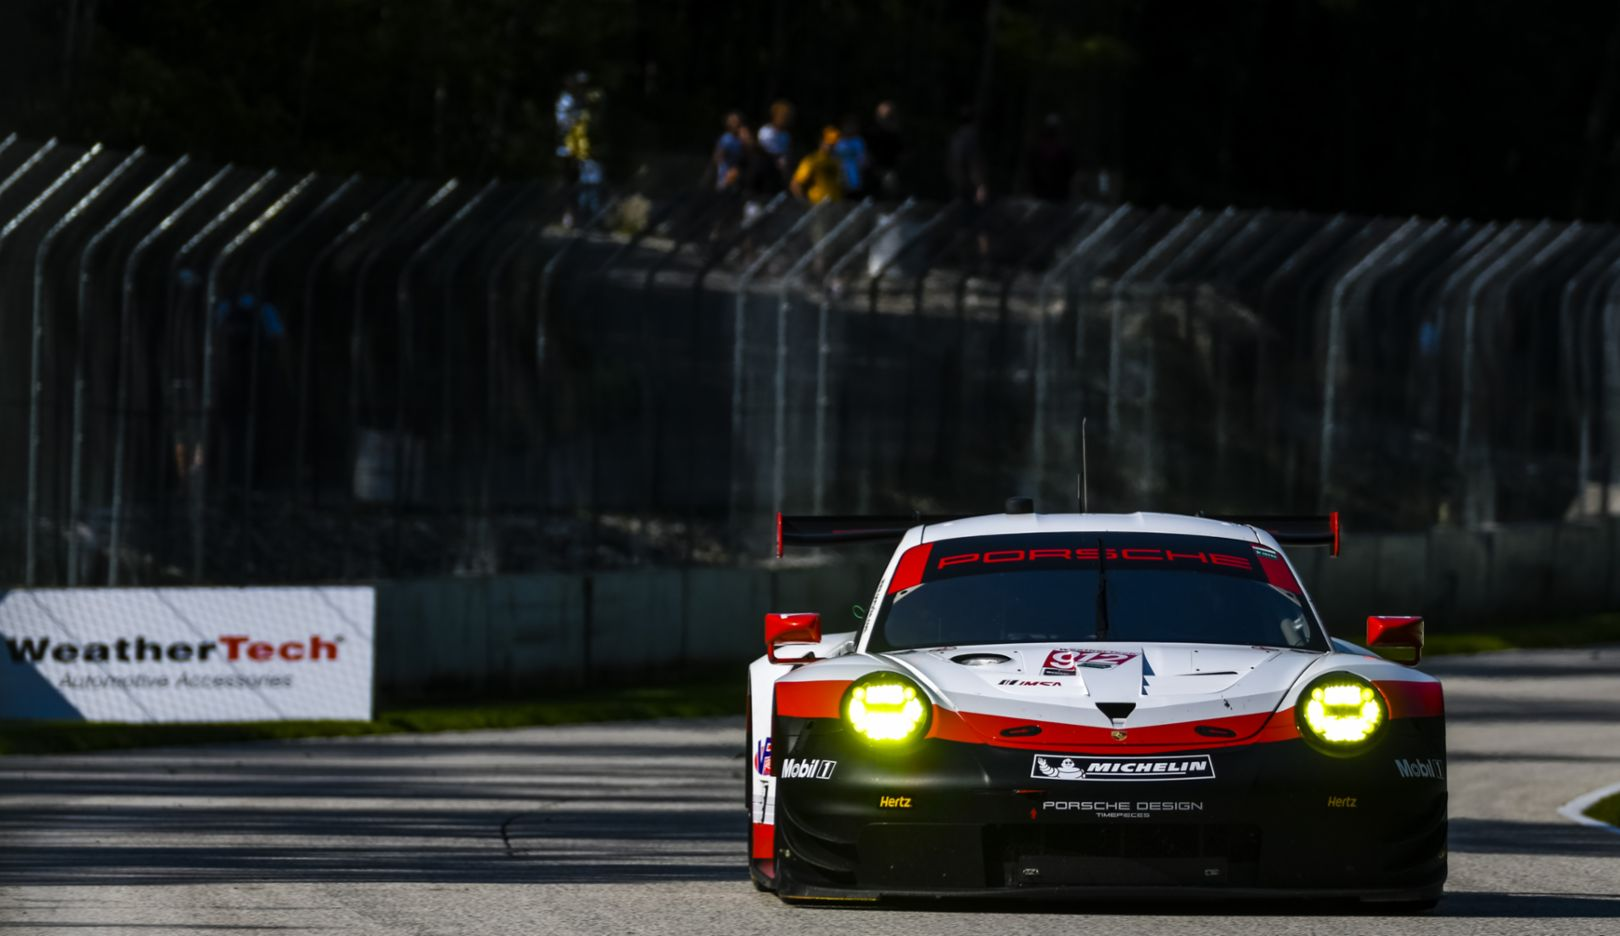 911 RSR, IMSA WeatherTech Sportscar Championship, Qualifying, Elkhart Lake, Road America, USA, 2017, Porsche AG